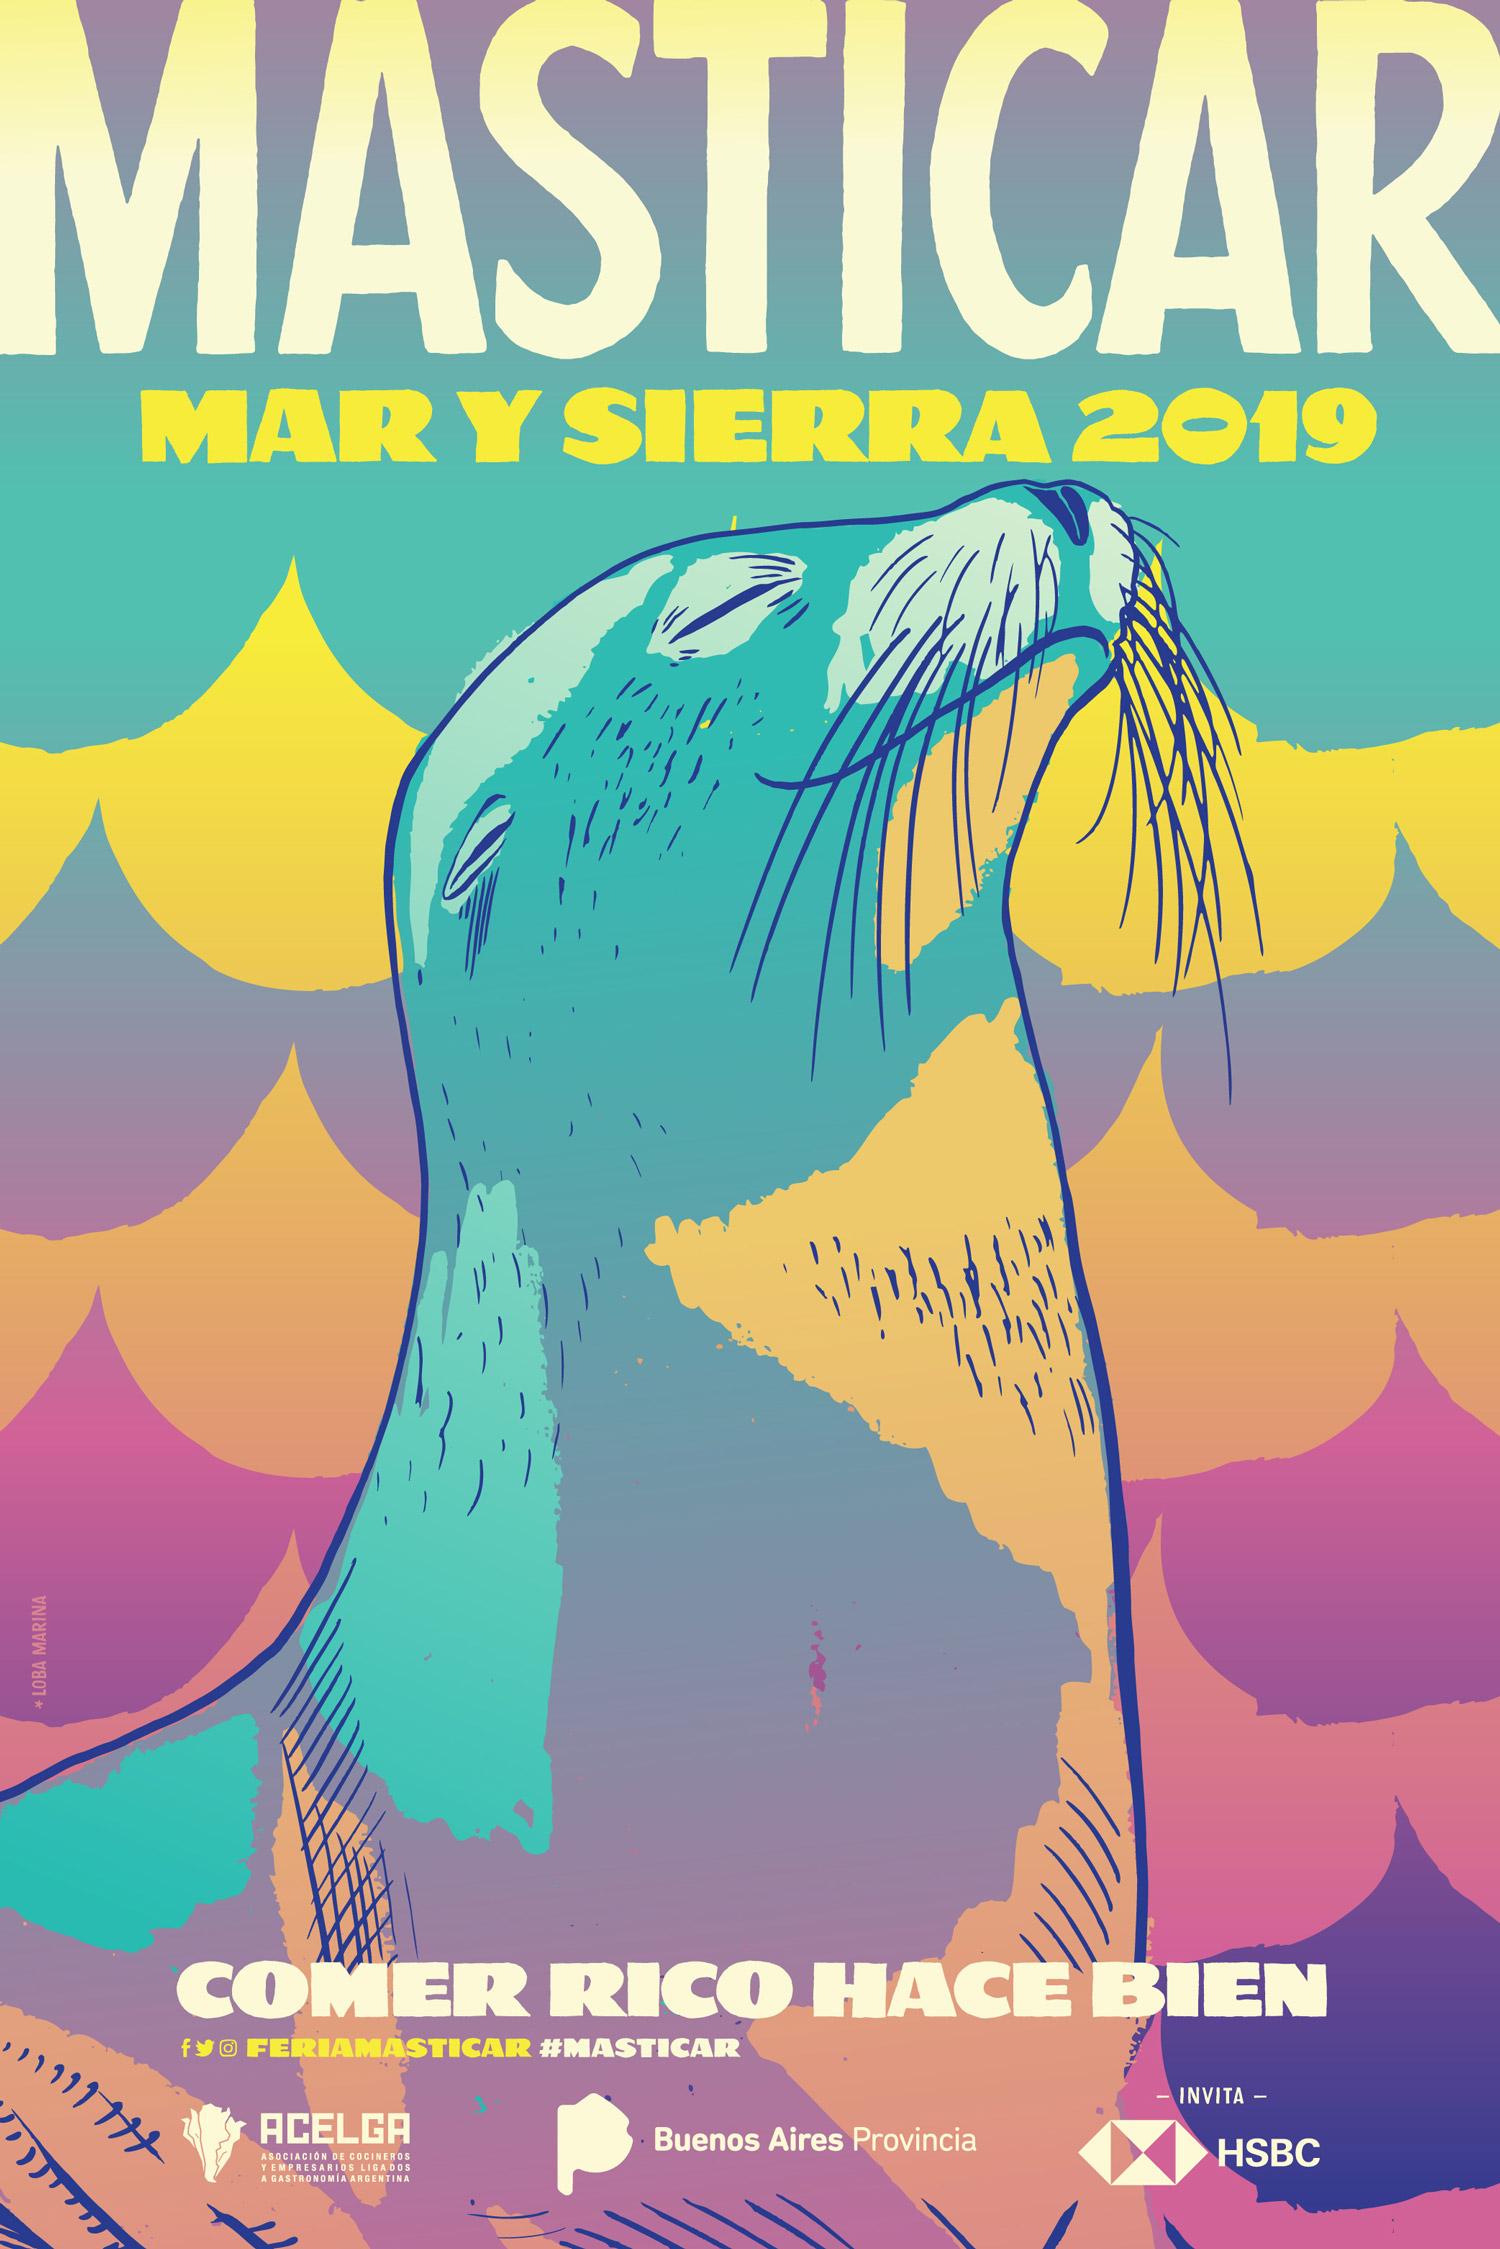 MASTICAR-Mar-y-Sierra-2019_Yanina-Arabena_Guillermo-Vizzari_03.jpg